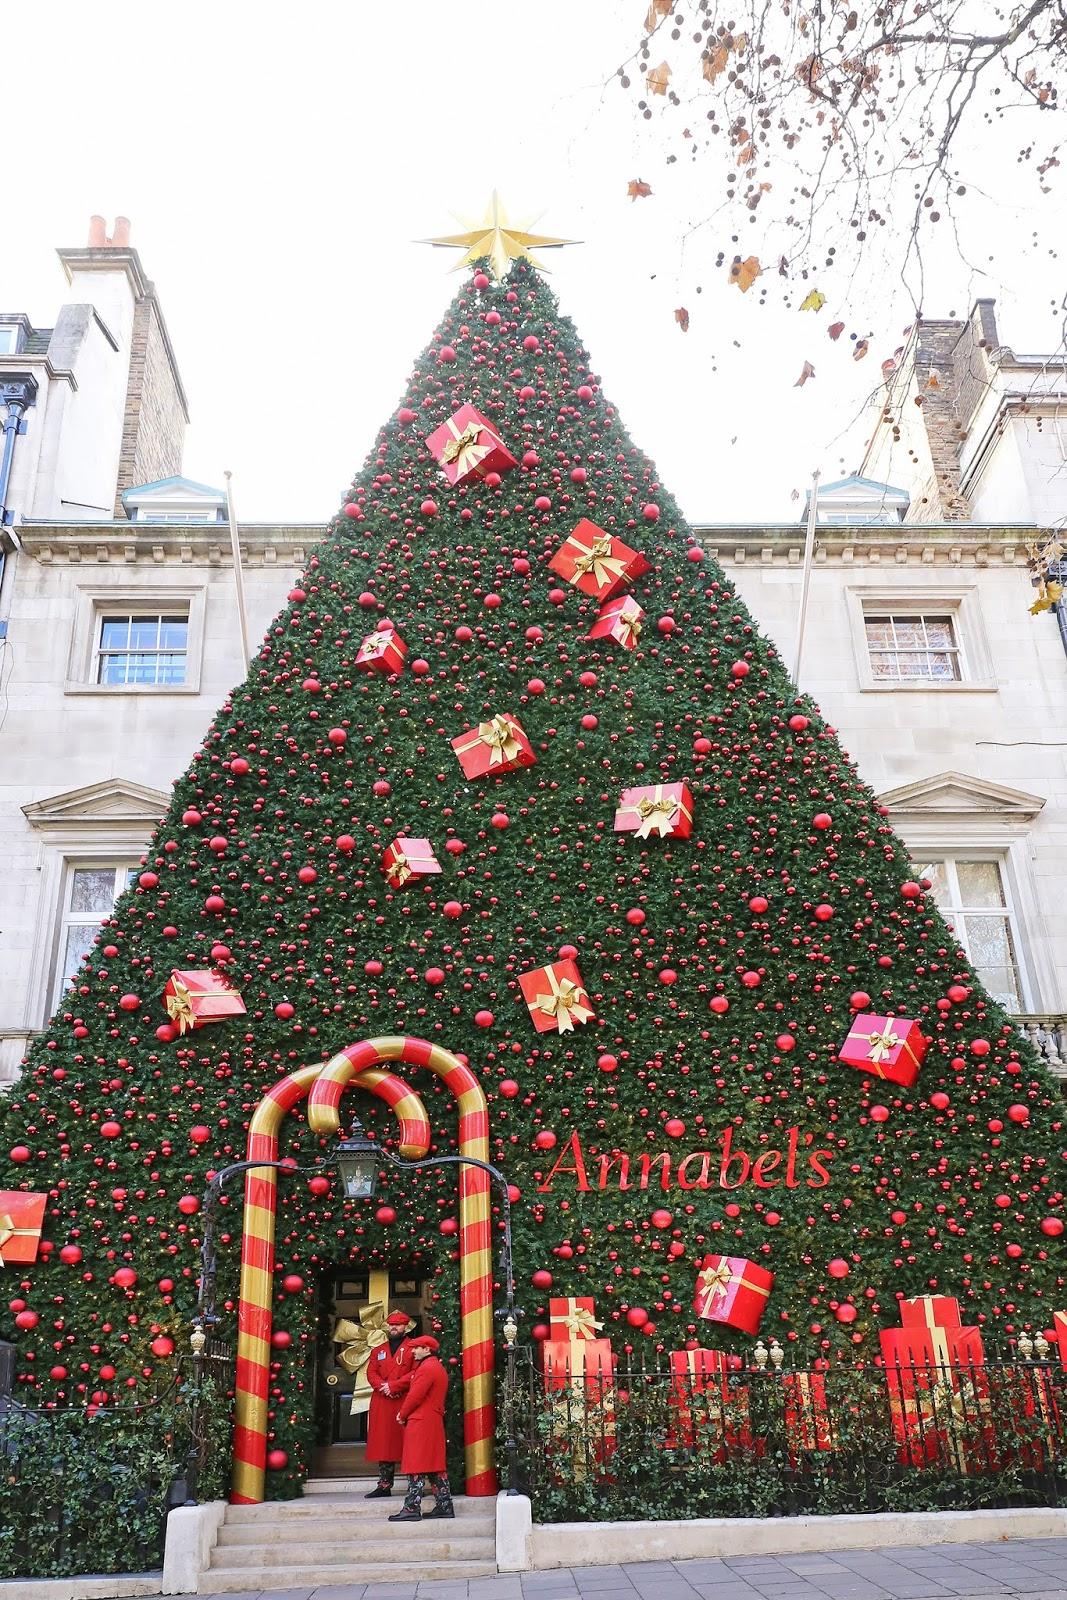 Christmas in London 2018 - Posh, Broke, & Bored